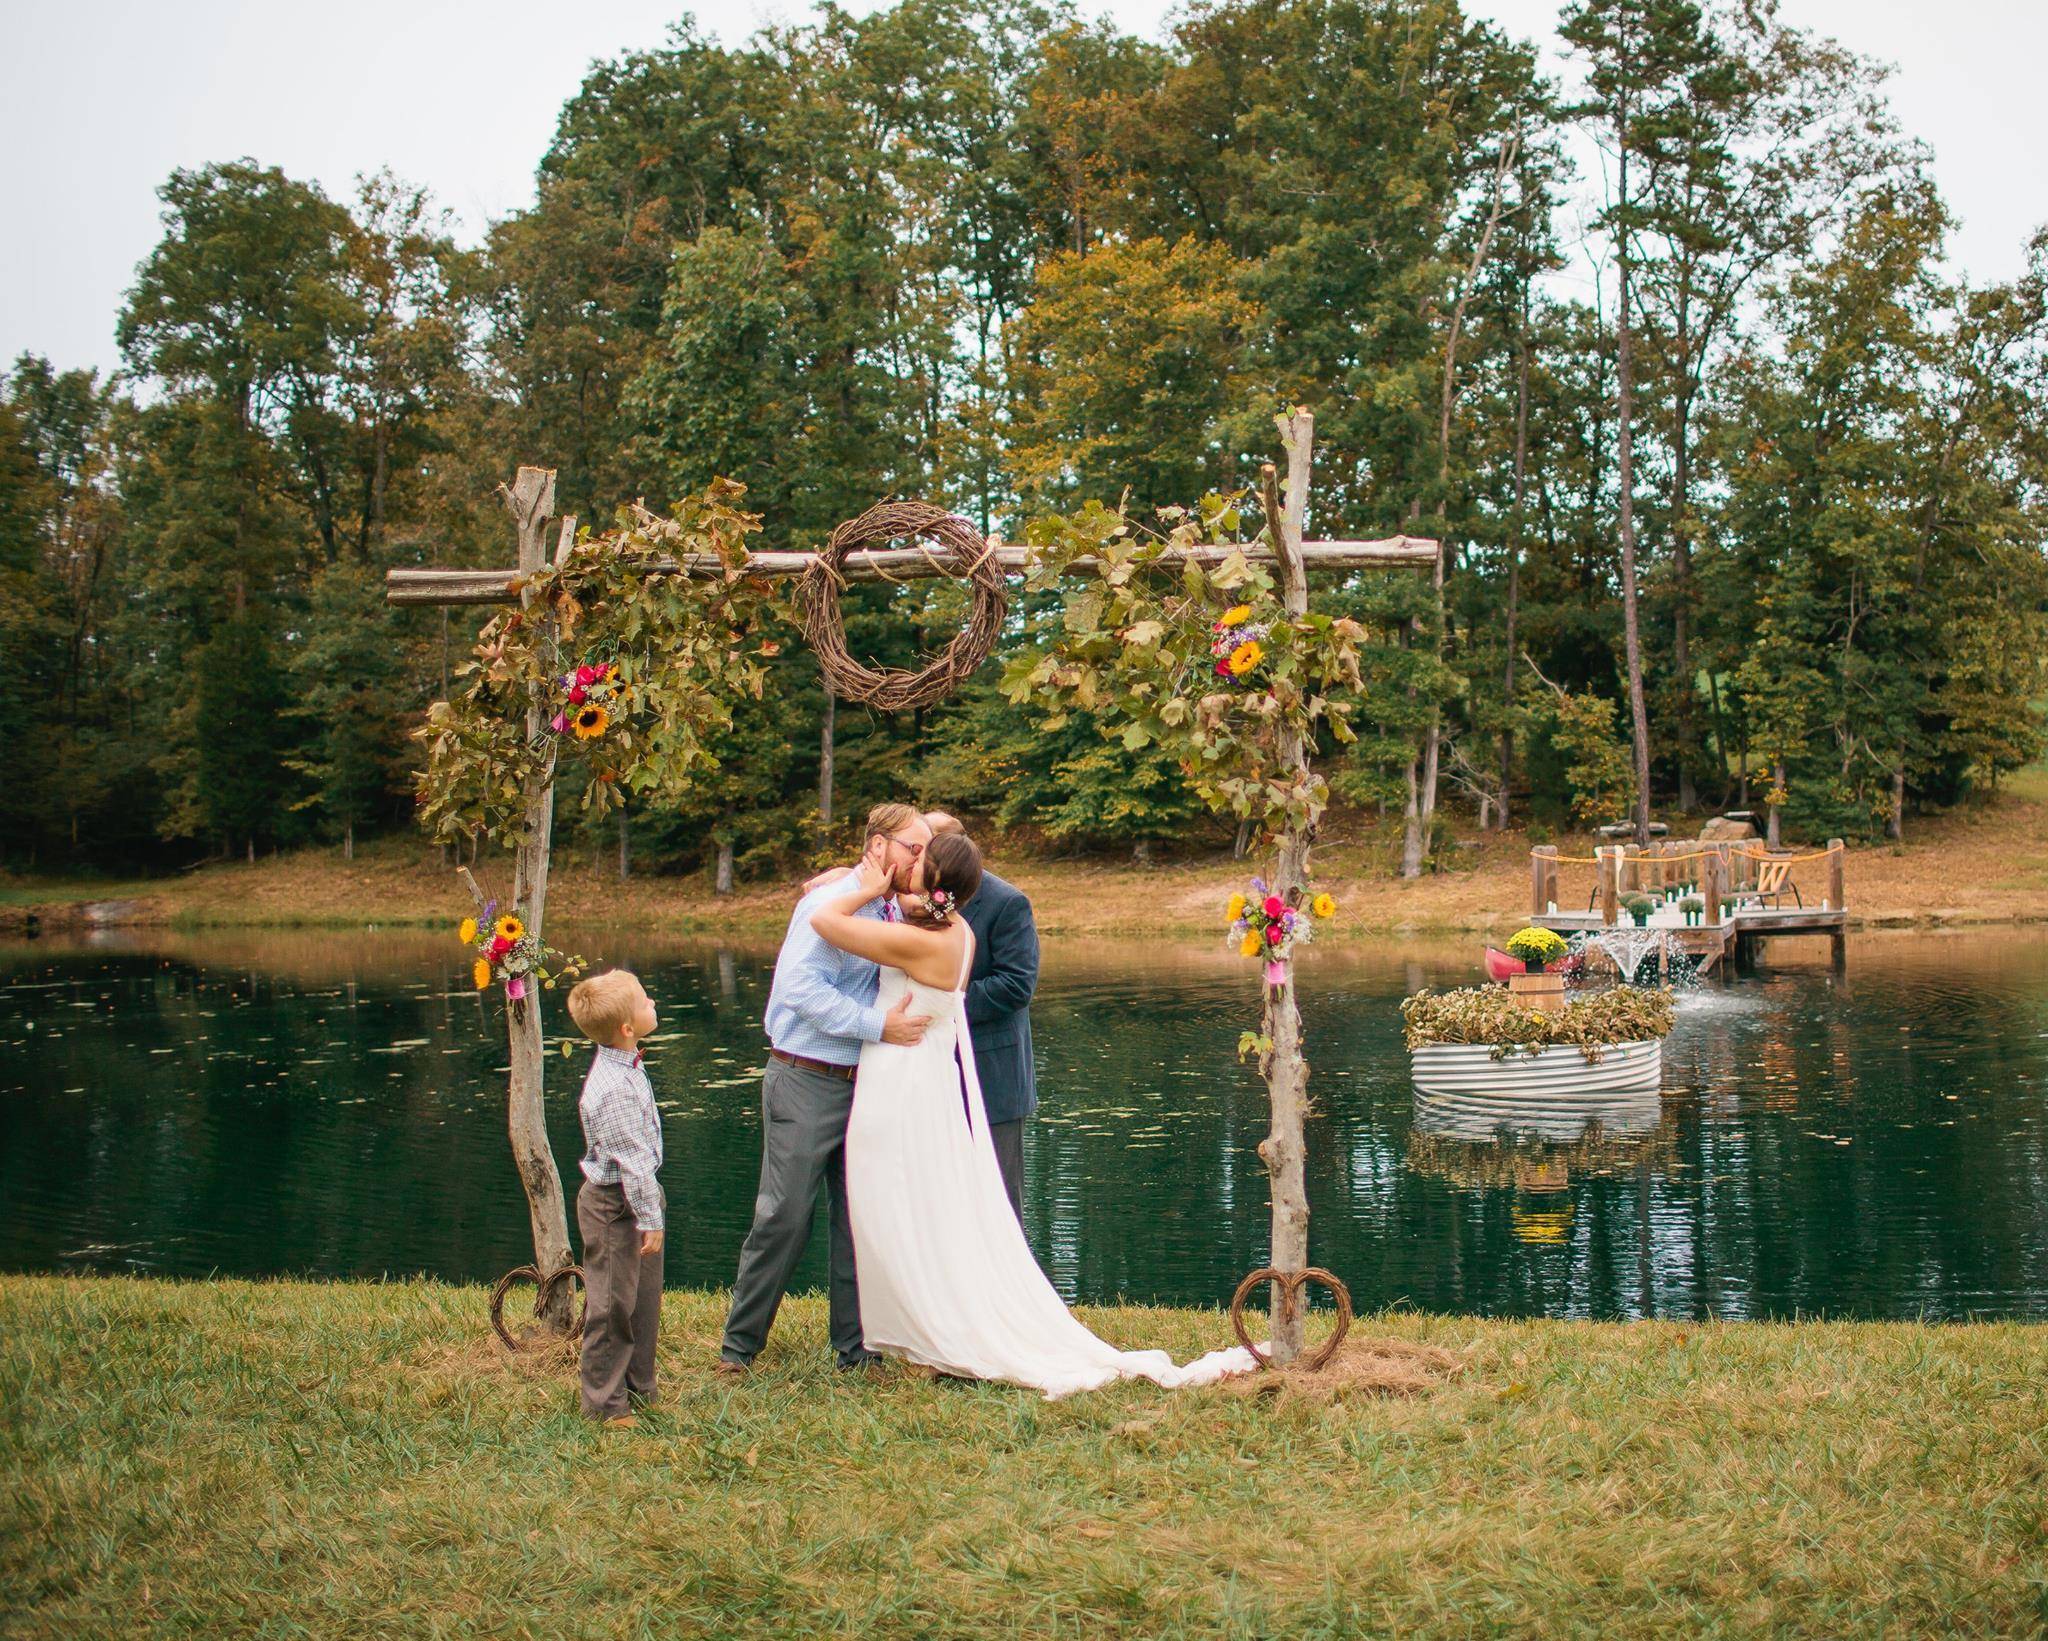 Farm Image Barn Wedding Venue.jpg